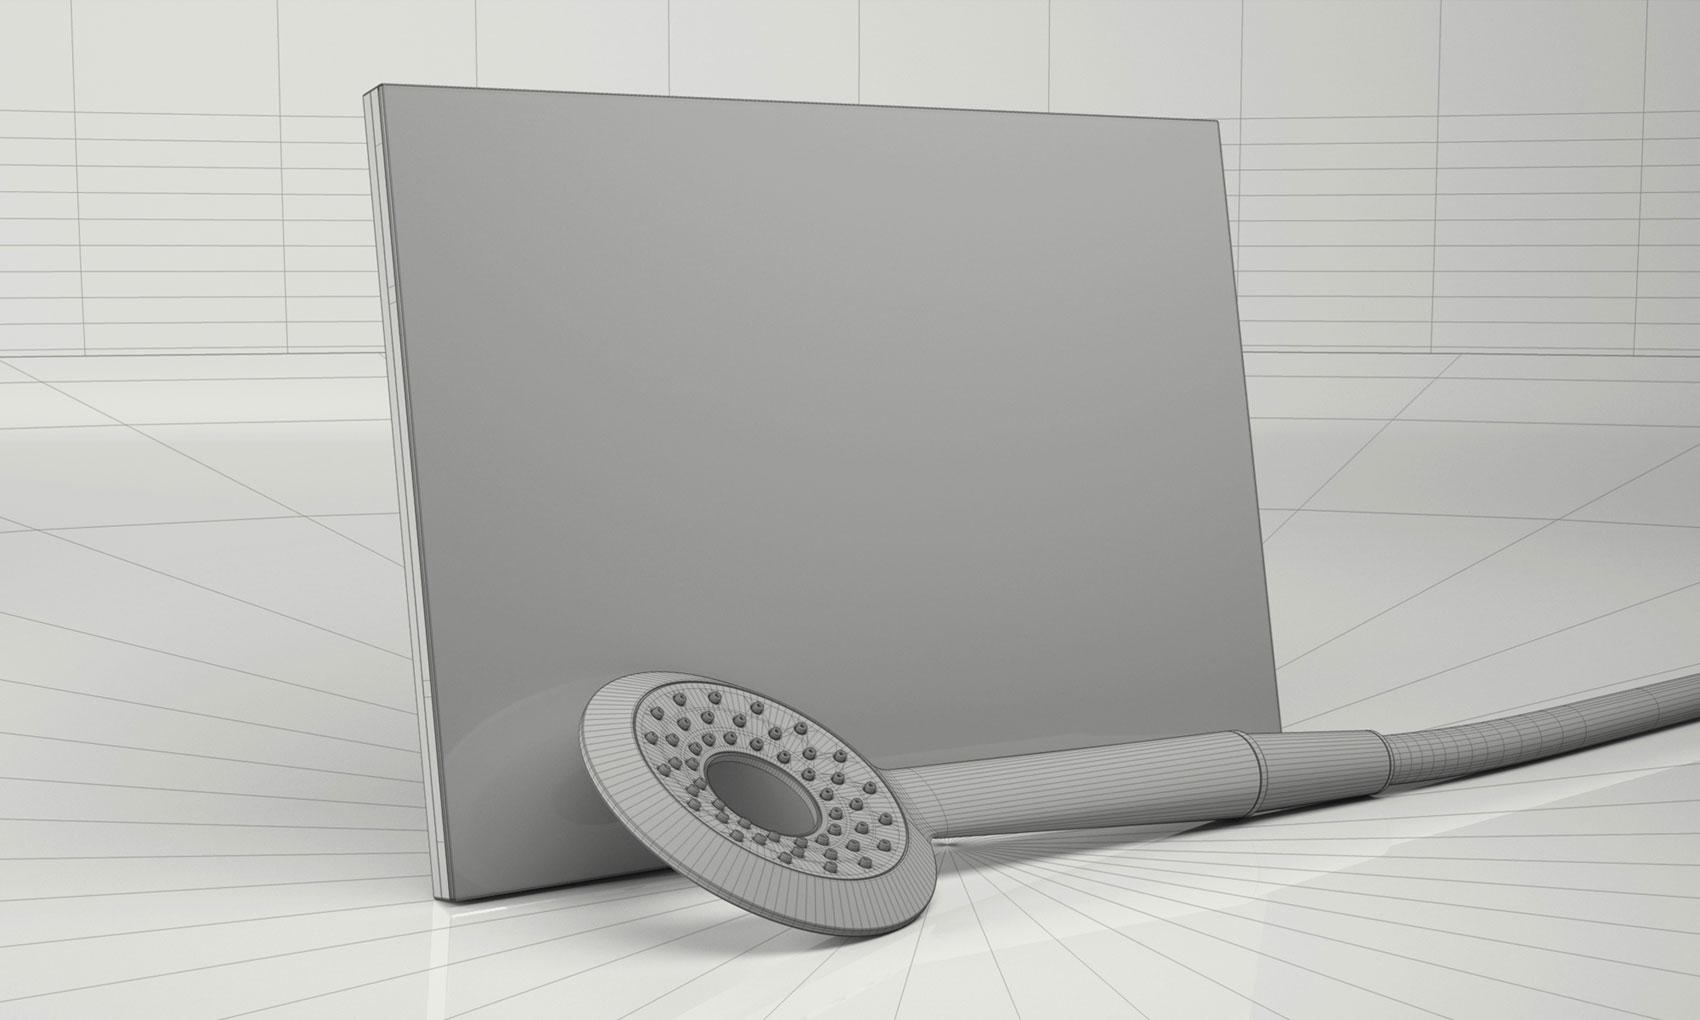 01-douche-showerpad-insens-inman